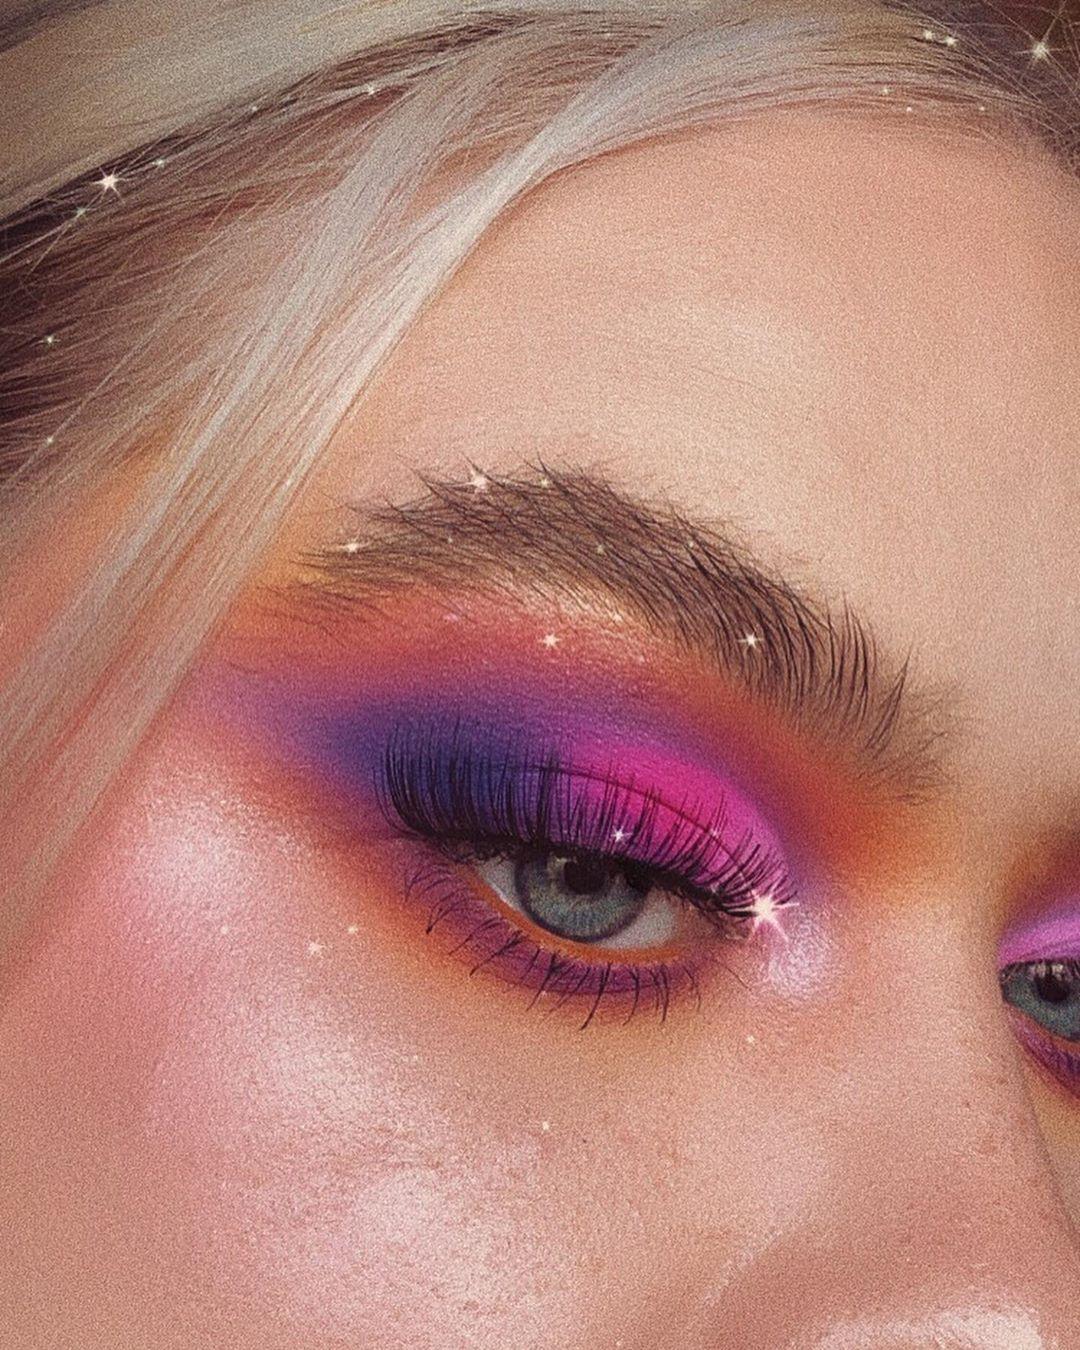 Slow Plum - Maquillage de soirée Eye liner smoky